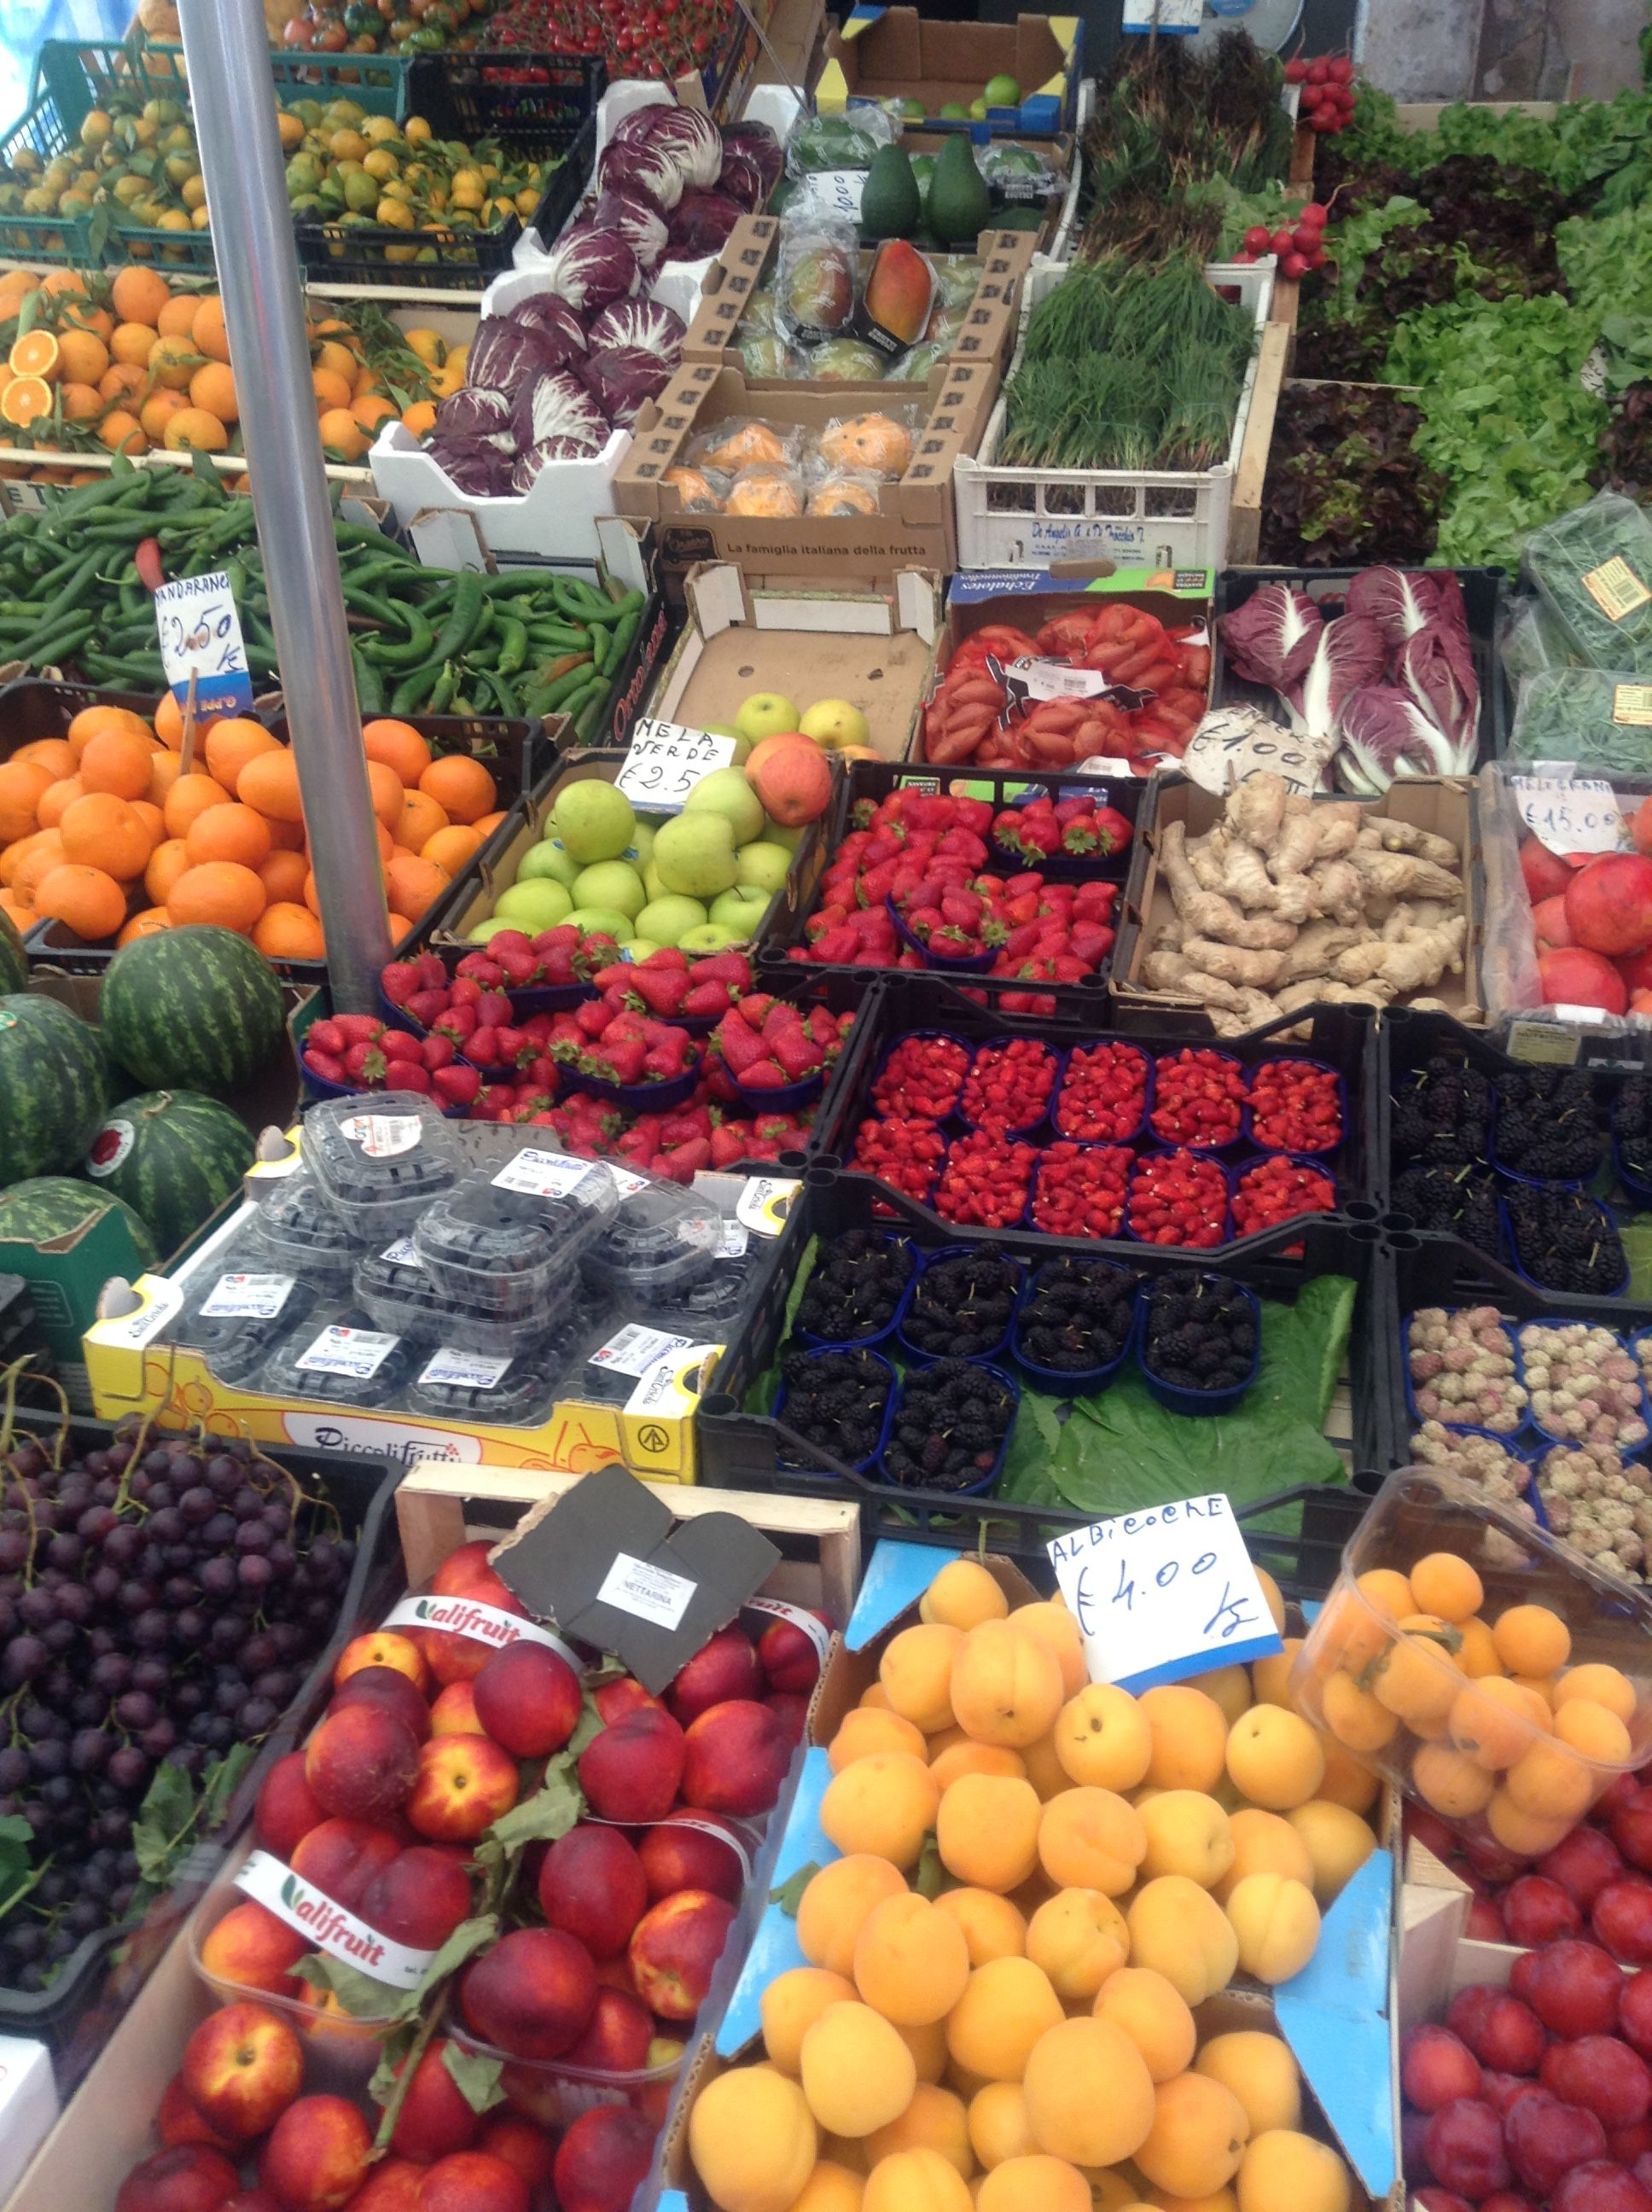 Our Morning Market In Ortigia Syracusa Sicily Wonderful Apricots Sicily Sicily Italy Marketing